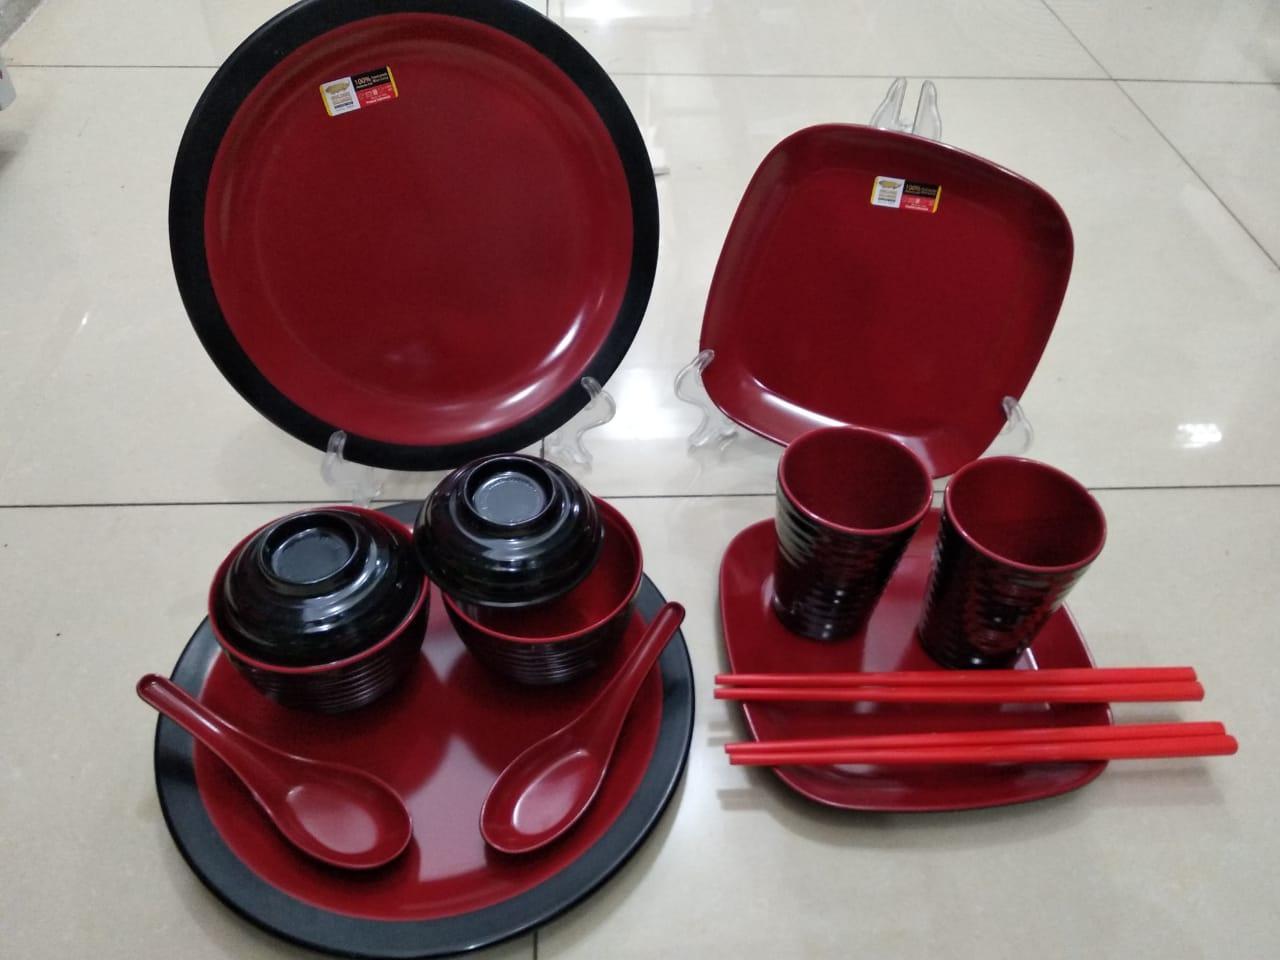 ... Golden Dragon Mangkok Mie Bakso Melamine 7 Set 6pieces Daftar 3 Pcs W0705 Melamin Kaki 5